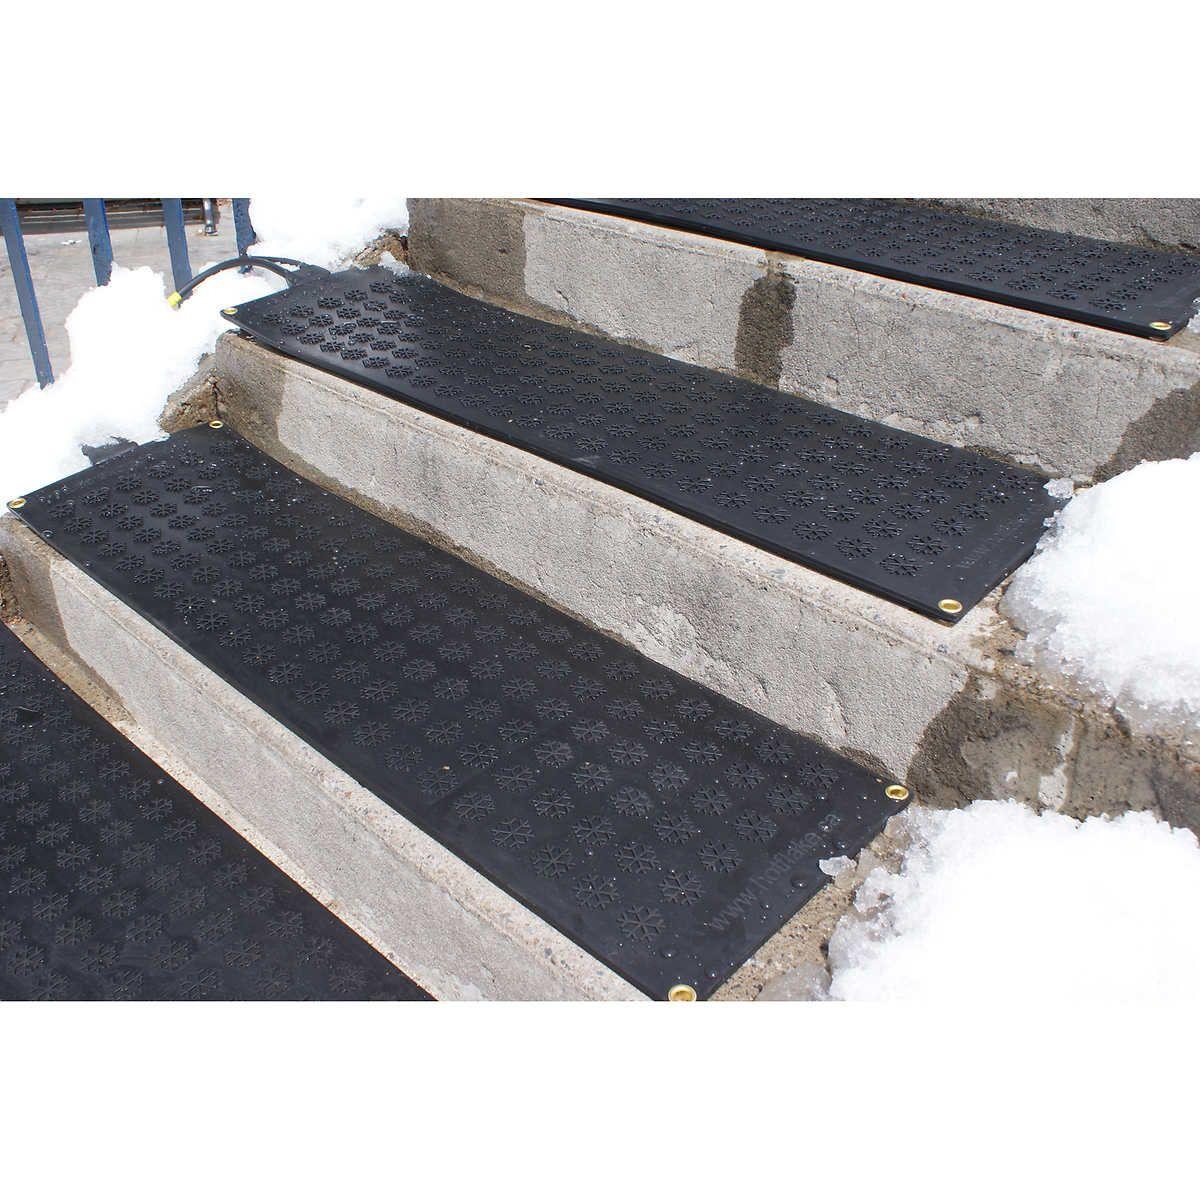 Best Pin By John Livolsi On Stuff To Buy Stair Mats Stair 400 x 300